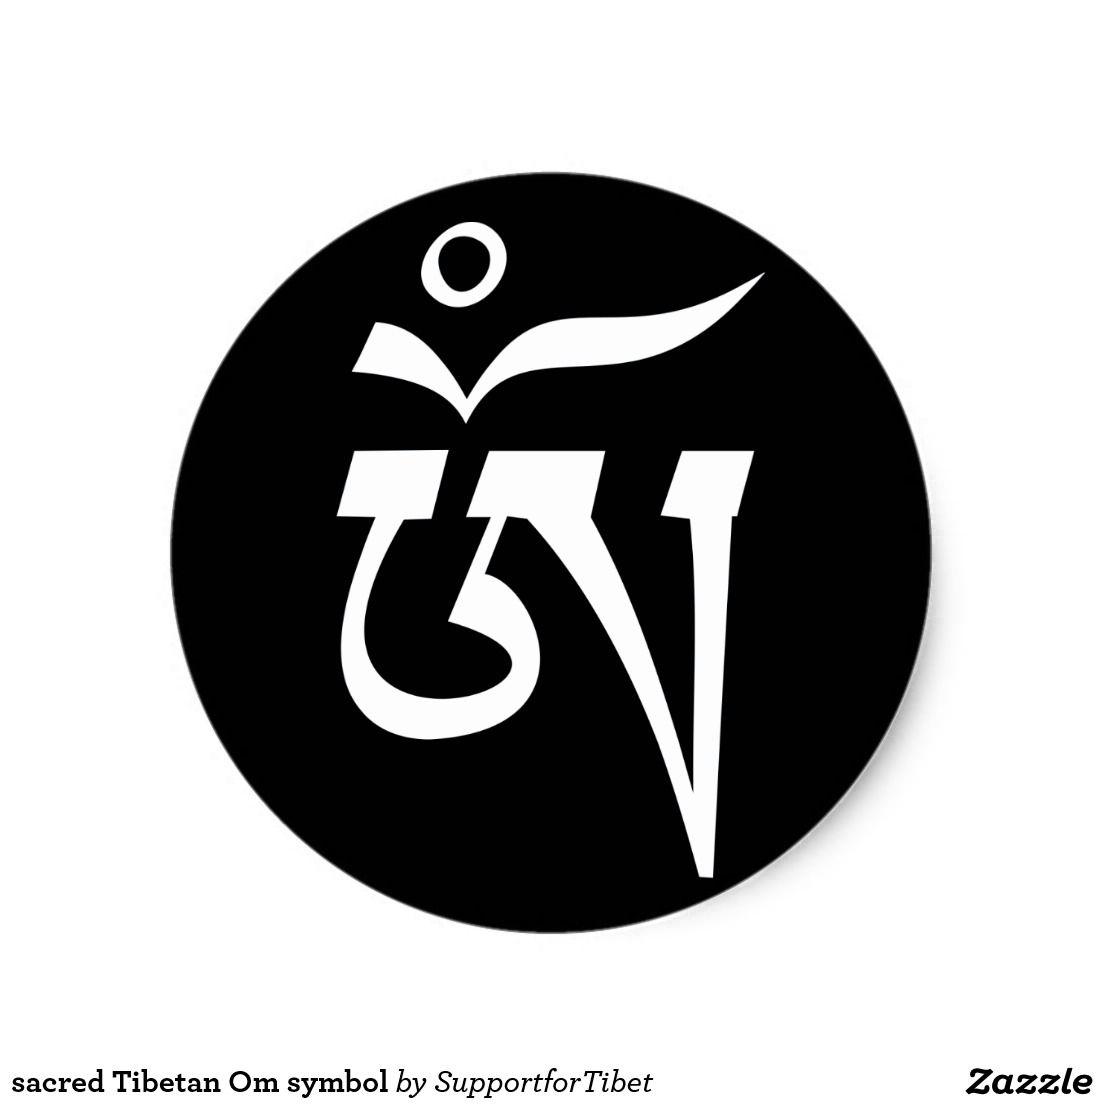 Buddhist symbols stickers zazzle om pinterest buddhist symbols stickers zazzle buycottarizona Images